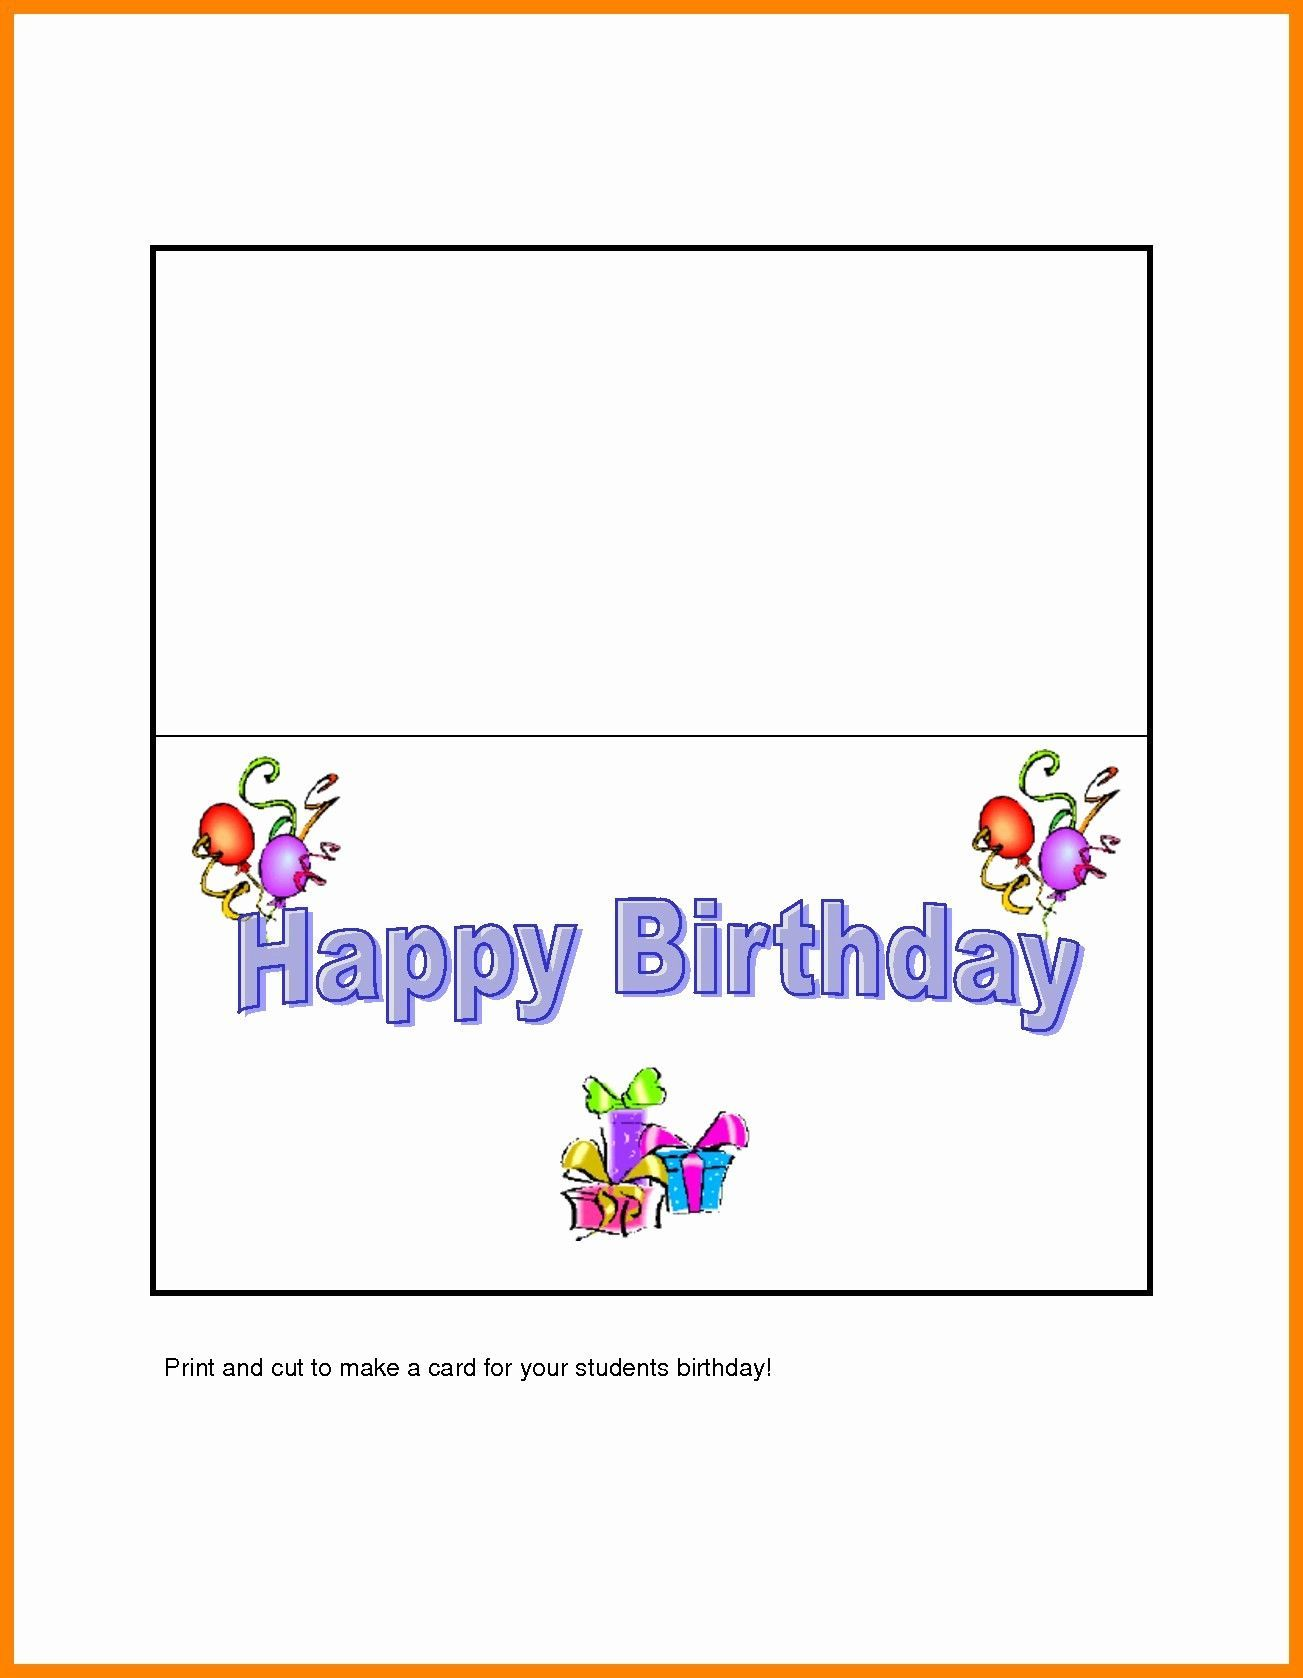 004 Rare Birthday Card Template Word Quarter Fold High Def Full